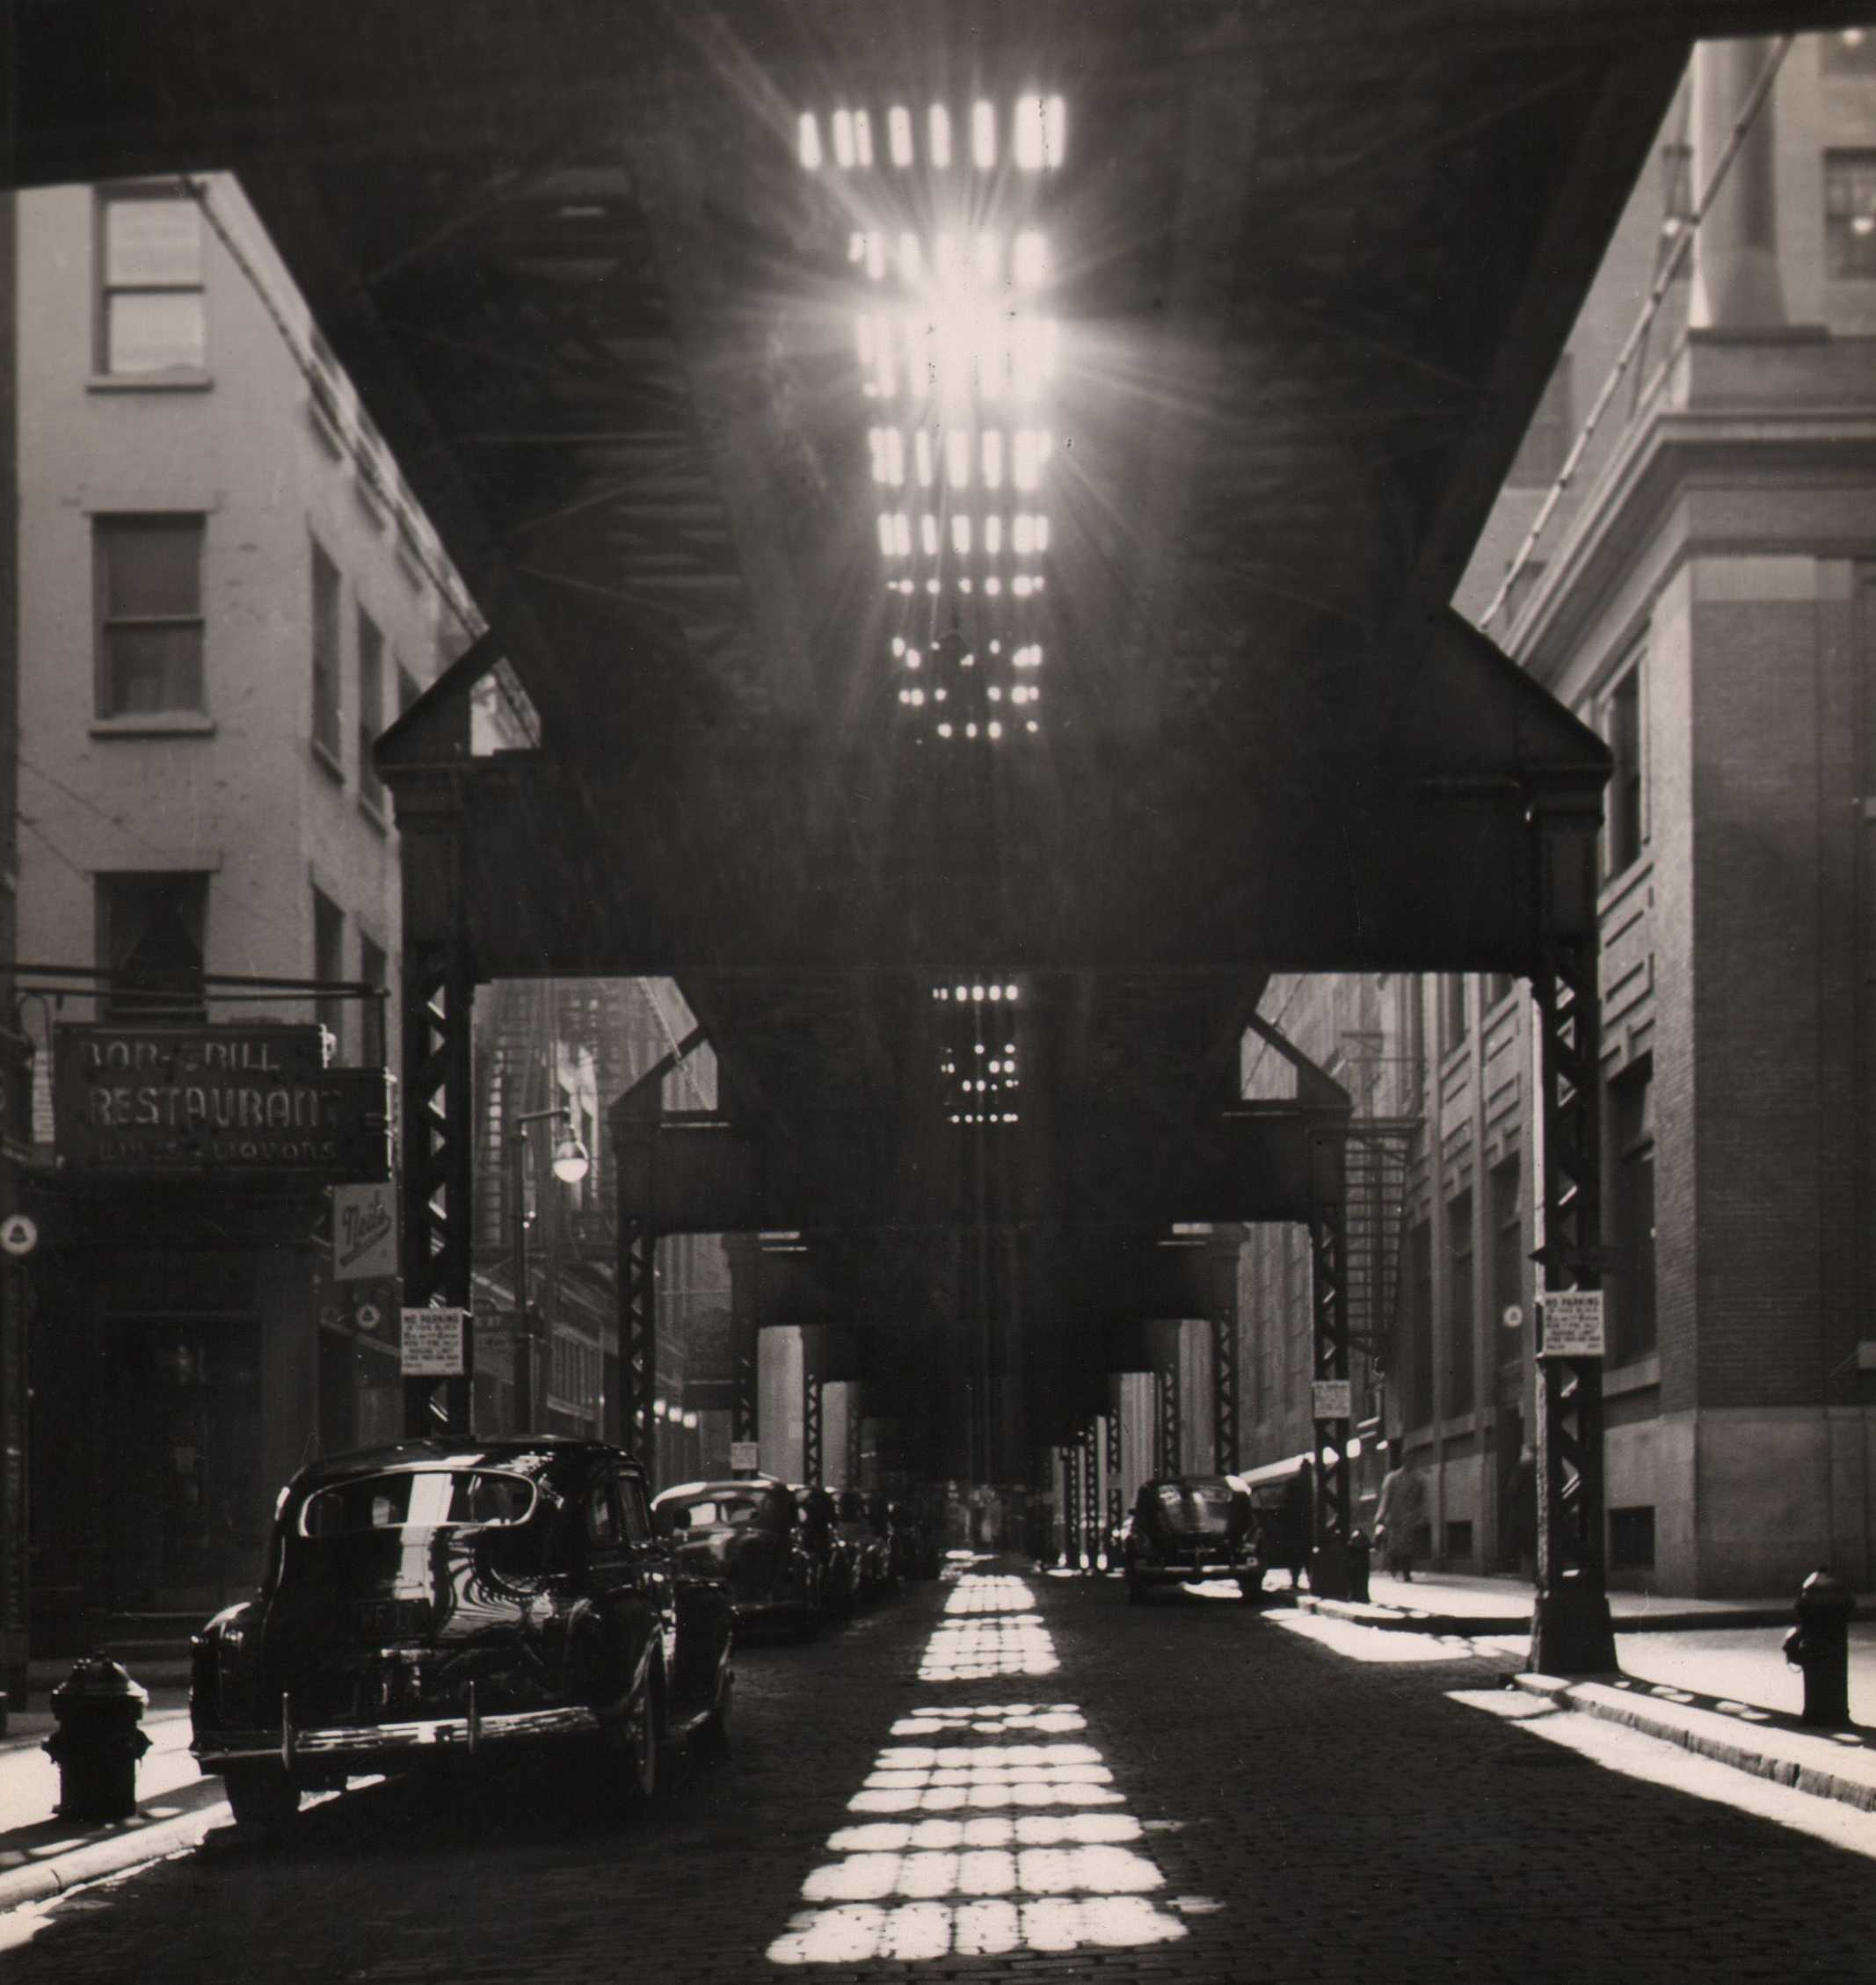 Fritz Neugass, The Sun Breaks Through, c. 1948